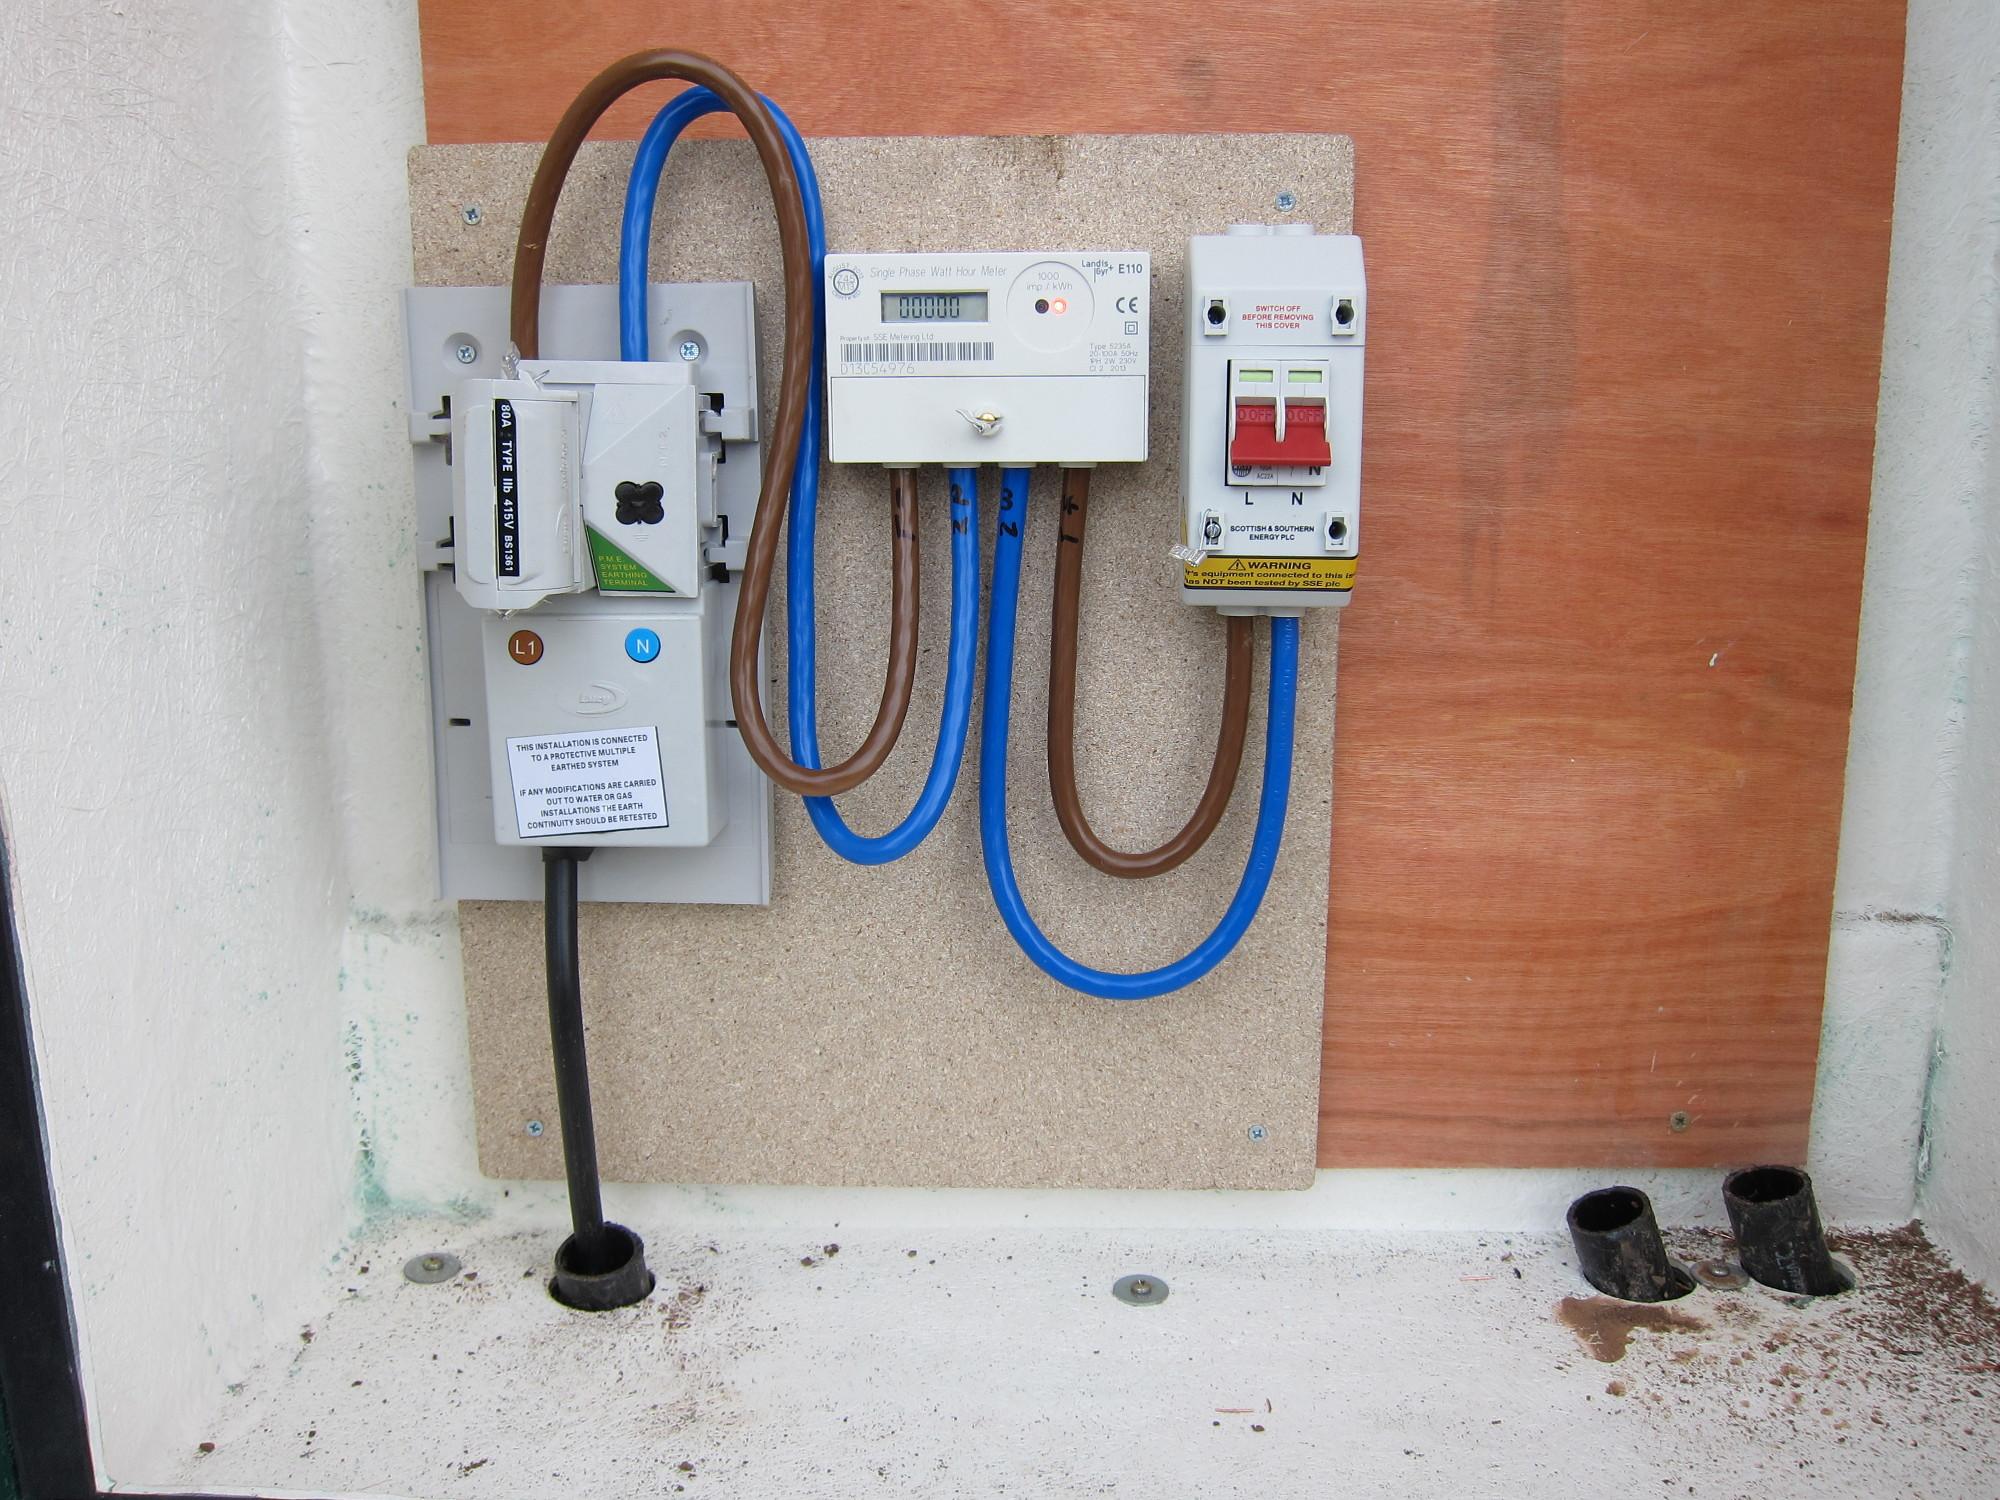 Caravan Mains Wiring Diagram Electricity Supply Re Installation Marsh Flatts Farm